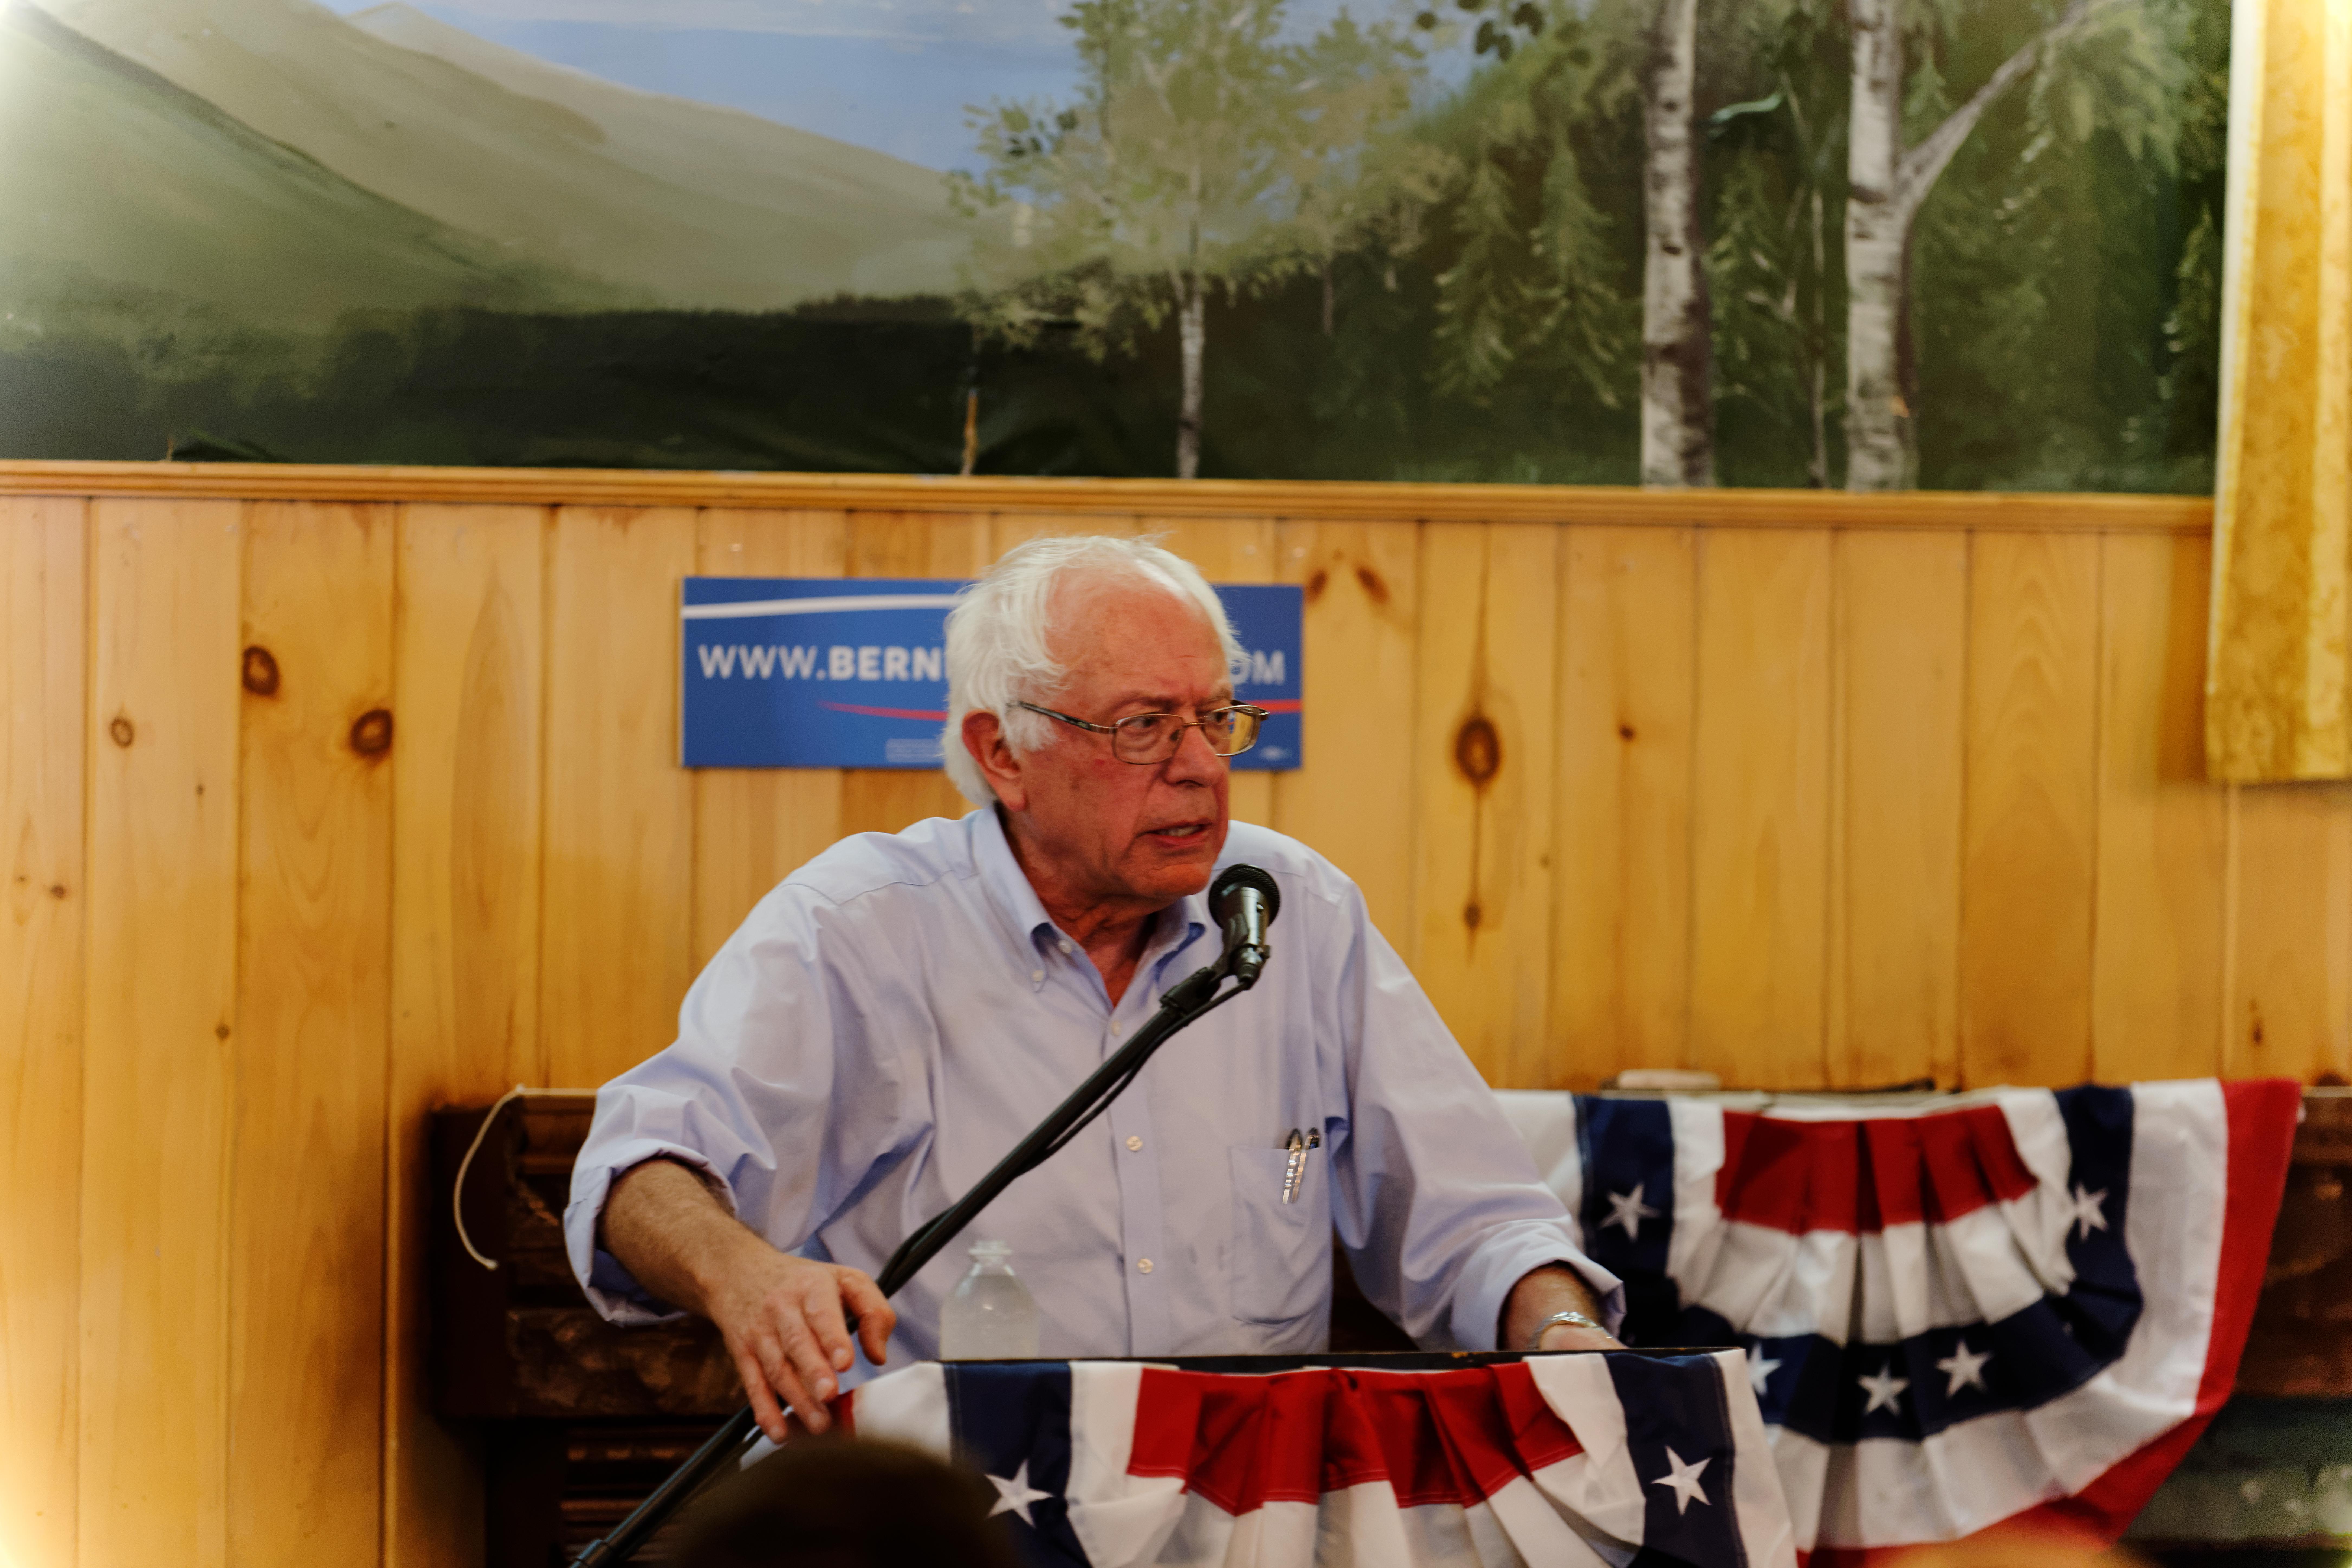 Sanders sales tax calculator